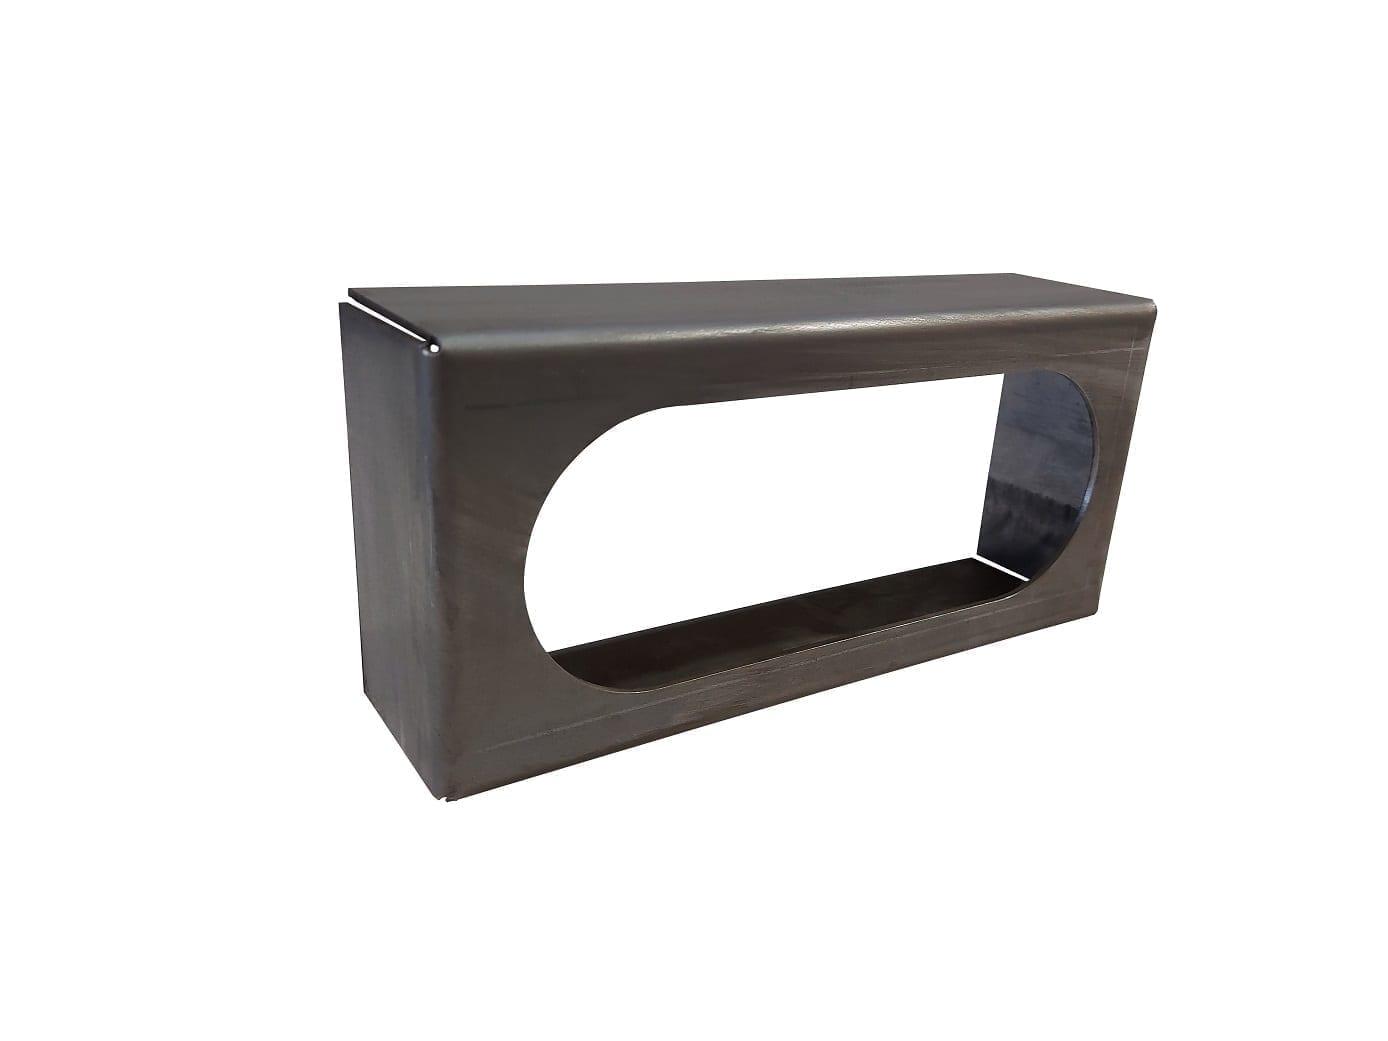 Single Oval Open Back Light Box